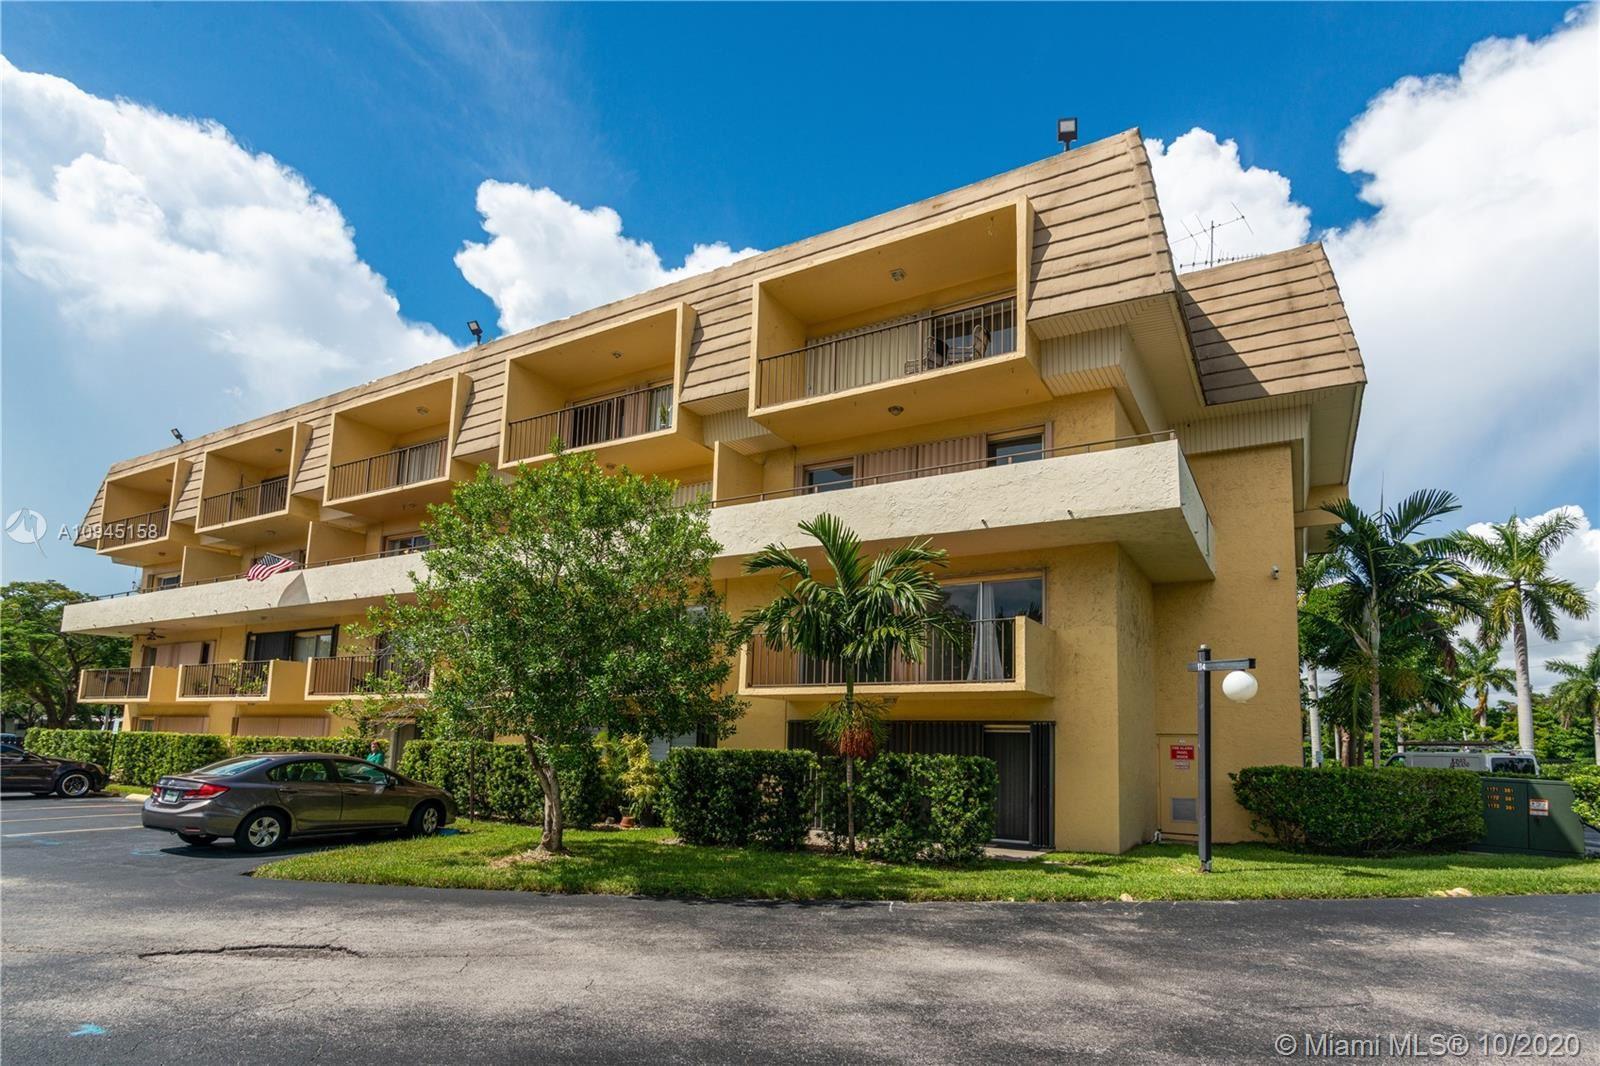 8000 SW 81st Dr #202, Miami, FL 33143 - #: A10945158